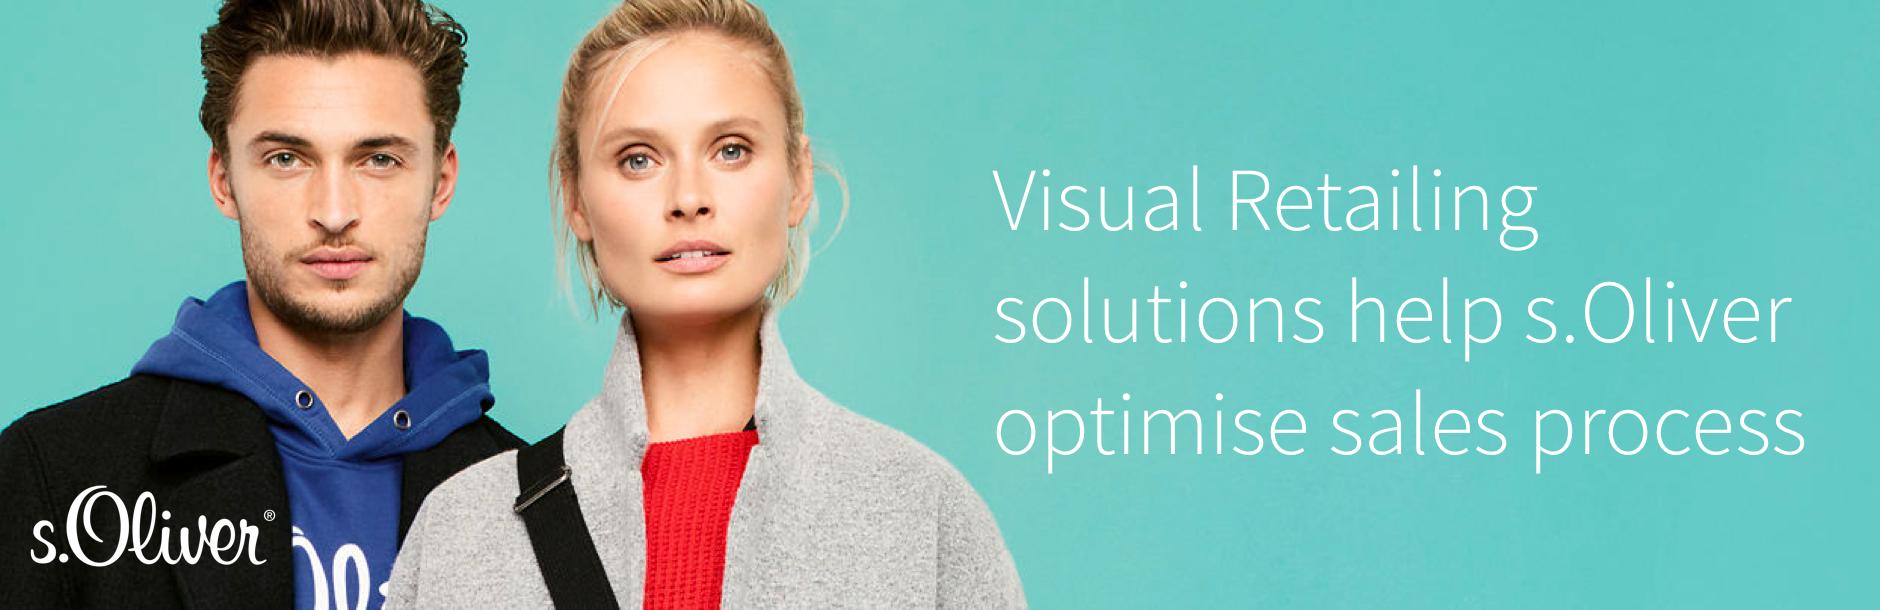 S.Oliver, Visual Retailing, Visual Merchandising Software, Planogram app, Fashion Visual Merchandising Software